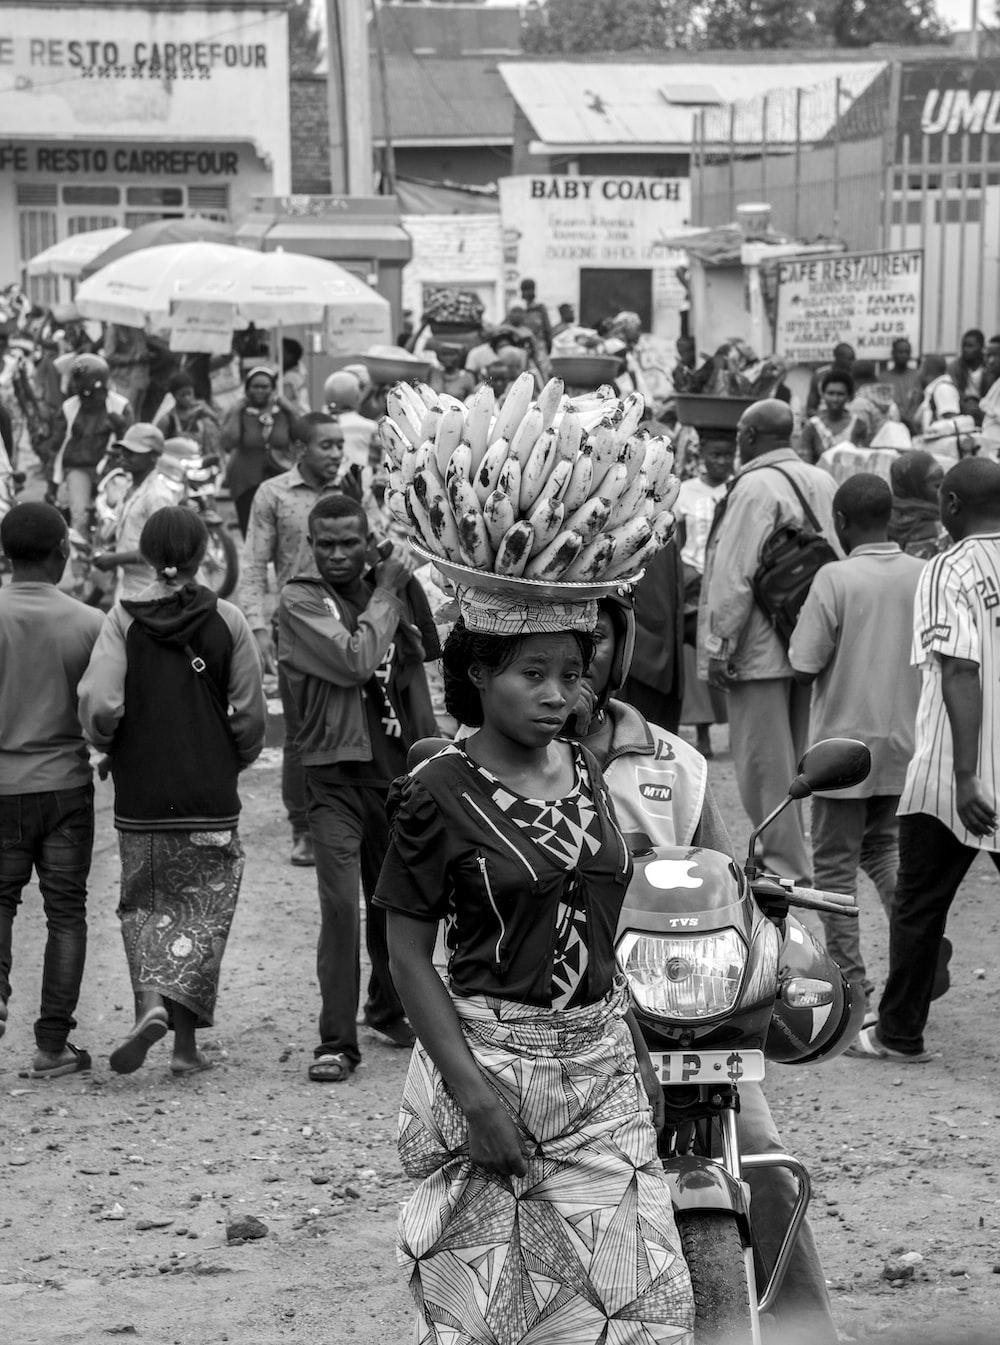 woman carrying bunch of banana on head walking near motorcycle